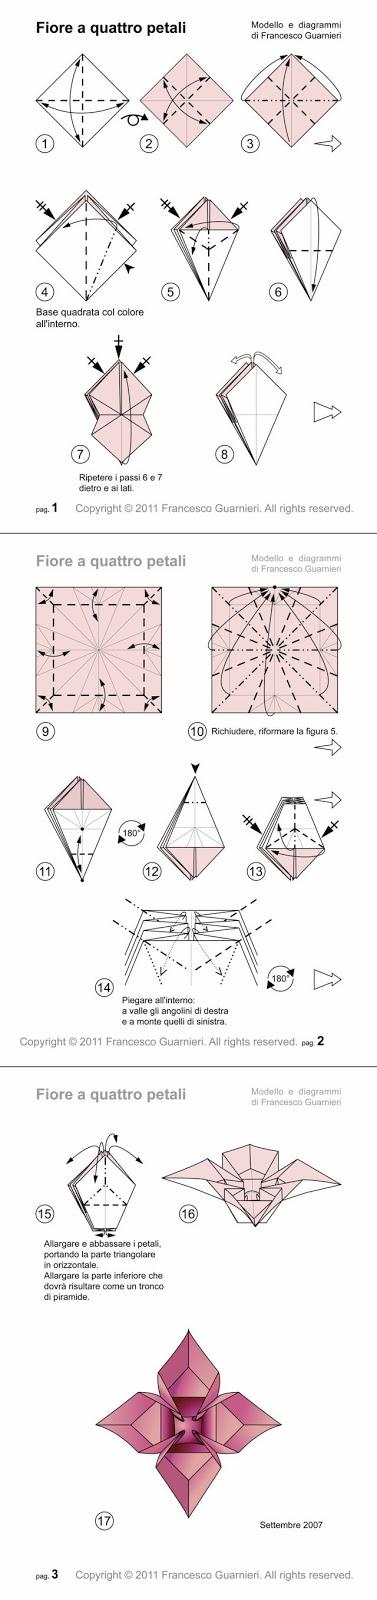 Origami diagrammi fiore a quattro petali flower with 4 petals by origami diagrammi fiore a quattro petali flower with 4 petals by francesco guarnieri mightylinksfo Images